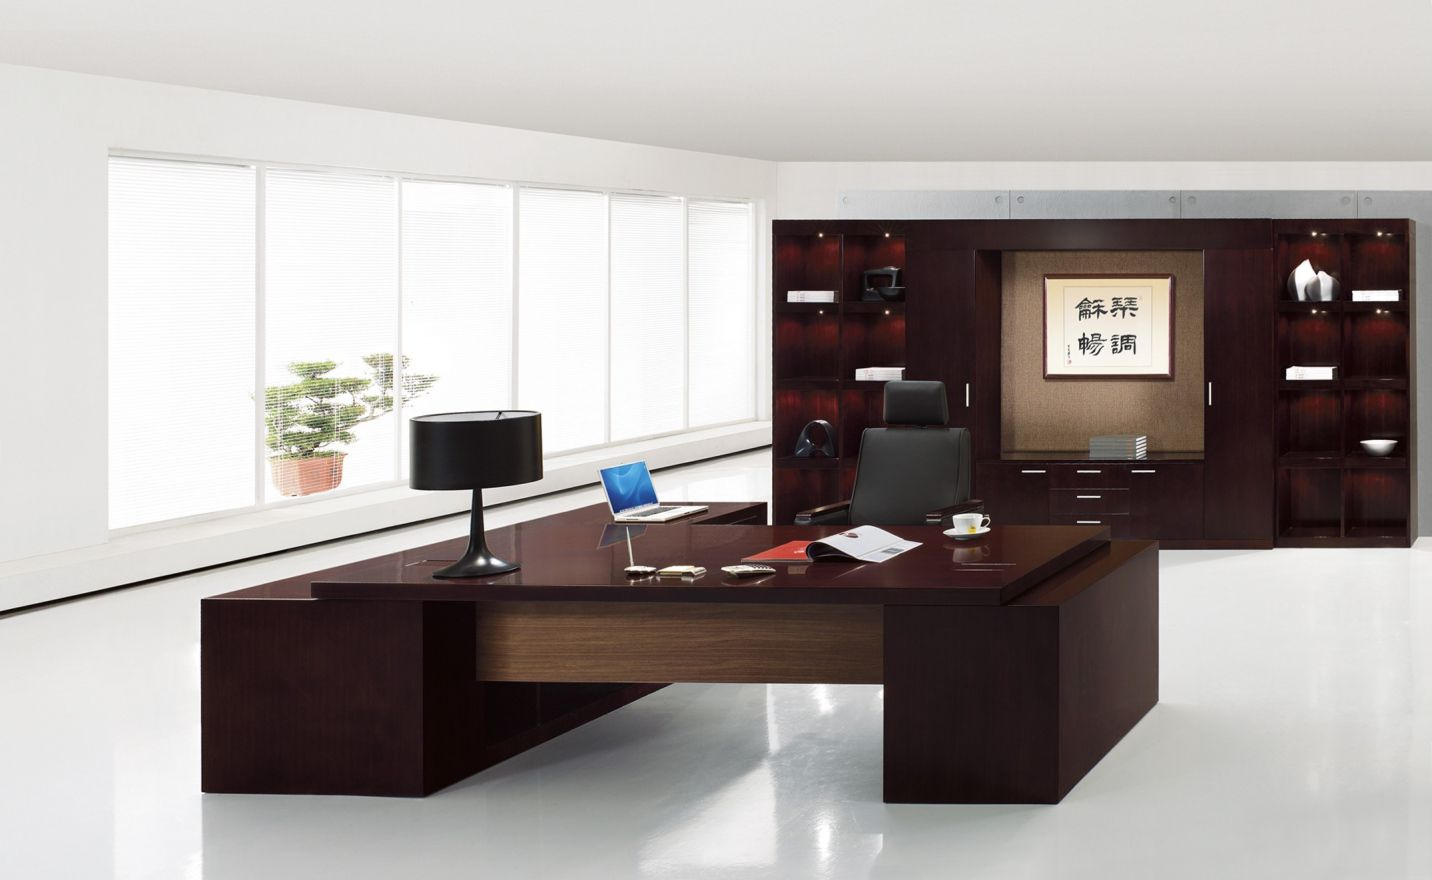 boss tableoffice deskexecutive deskmanager. boss tableoffice deskexecutive deskmanager. contemporary executive desks - home office furniture images check more at deskmanager c